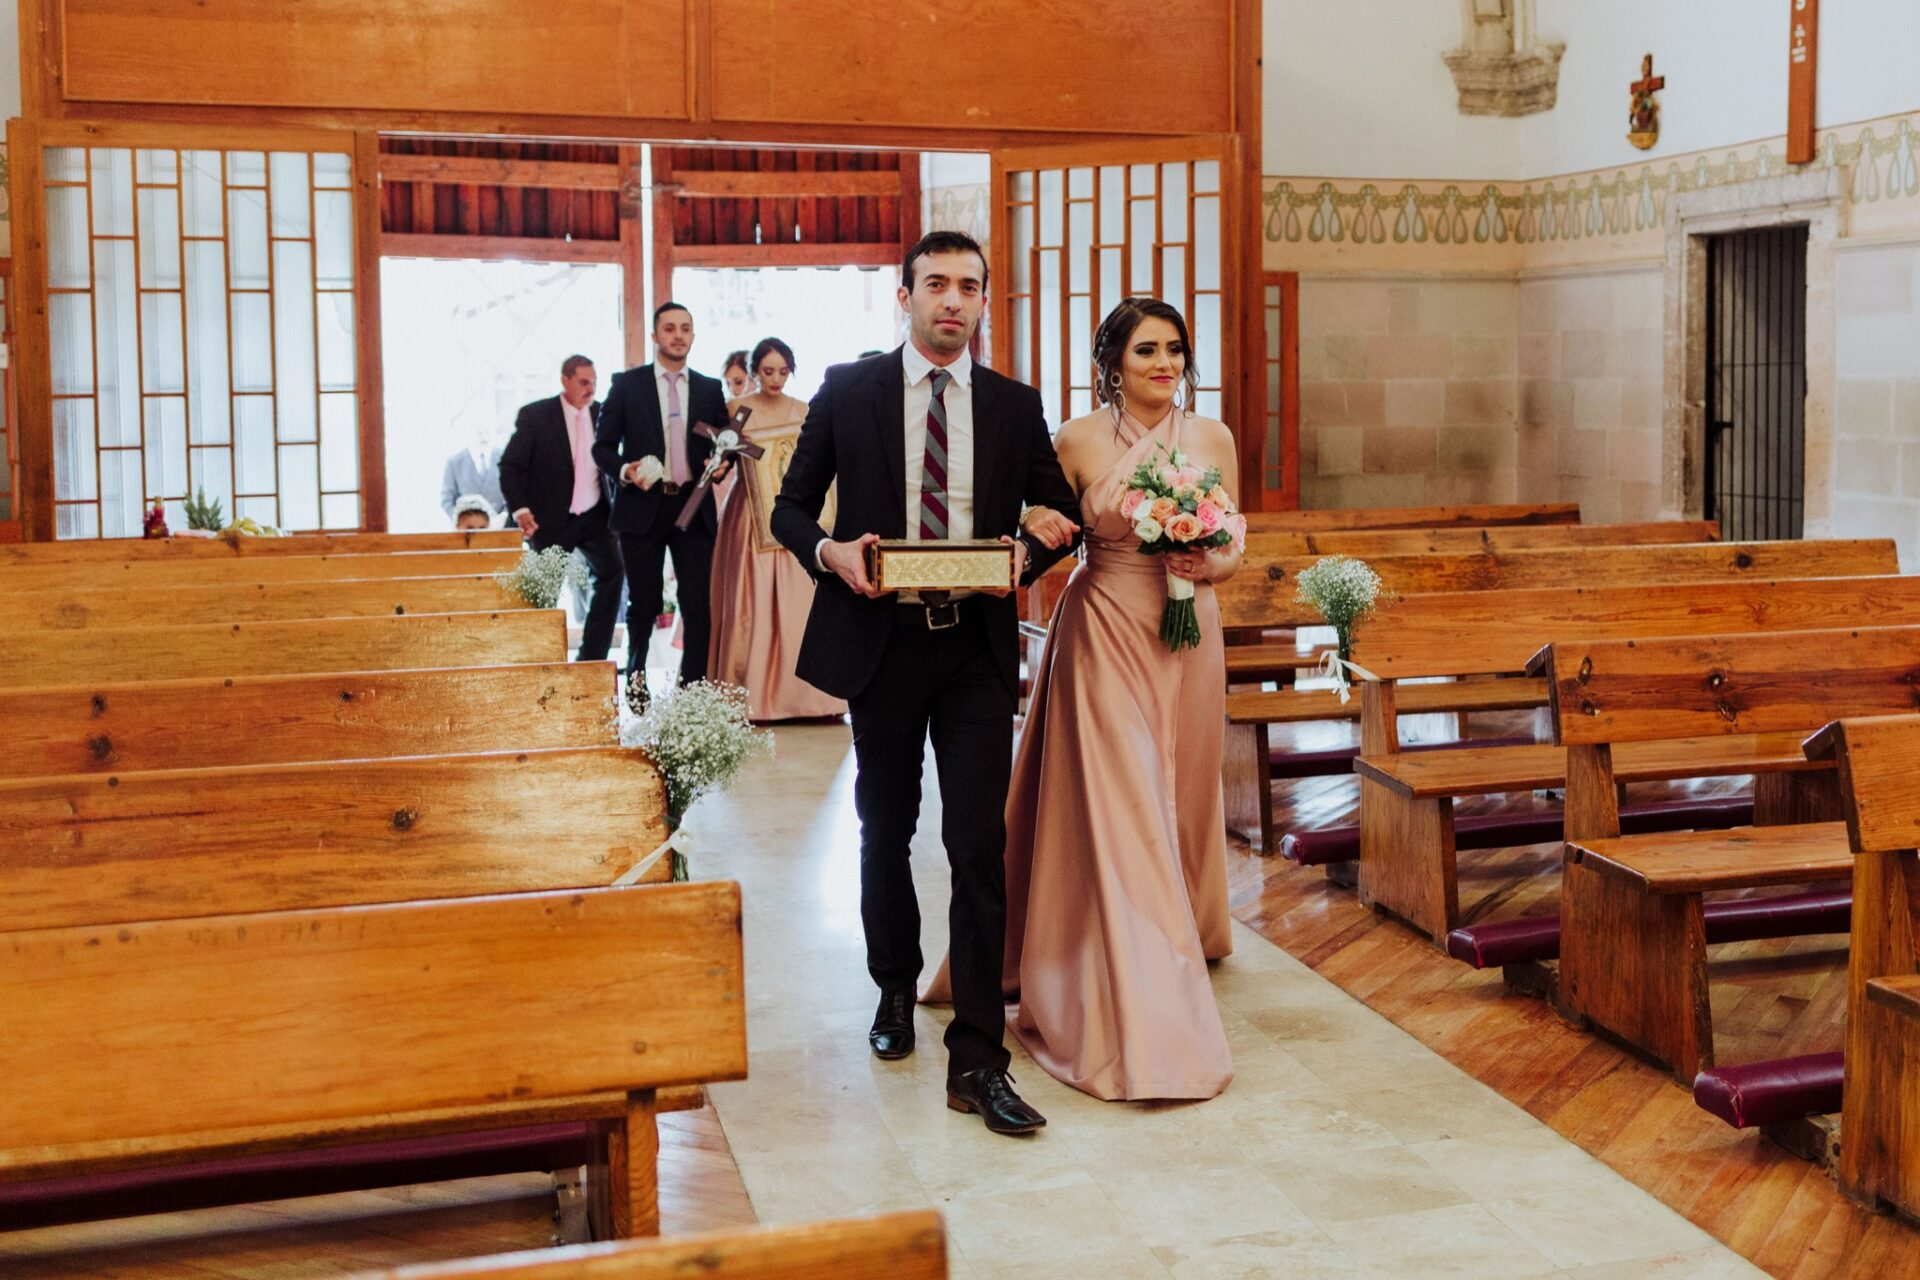 javier_noriega_fotografo_bodas_teul_zacatecas_wedding_photographer7a